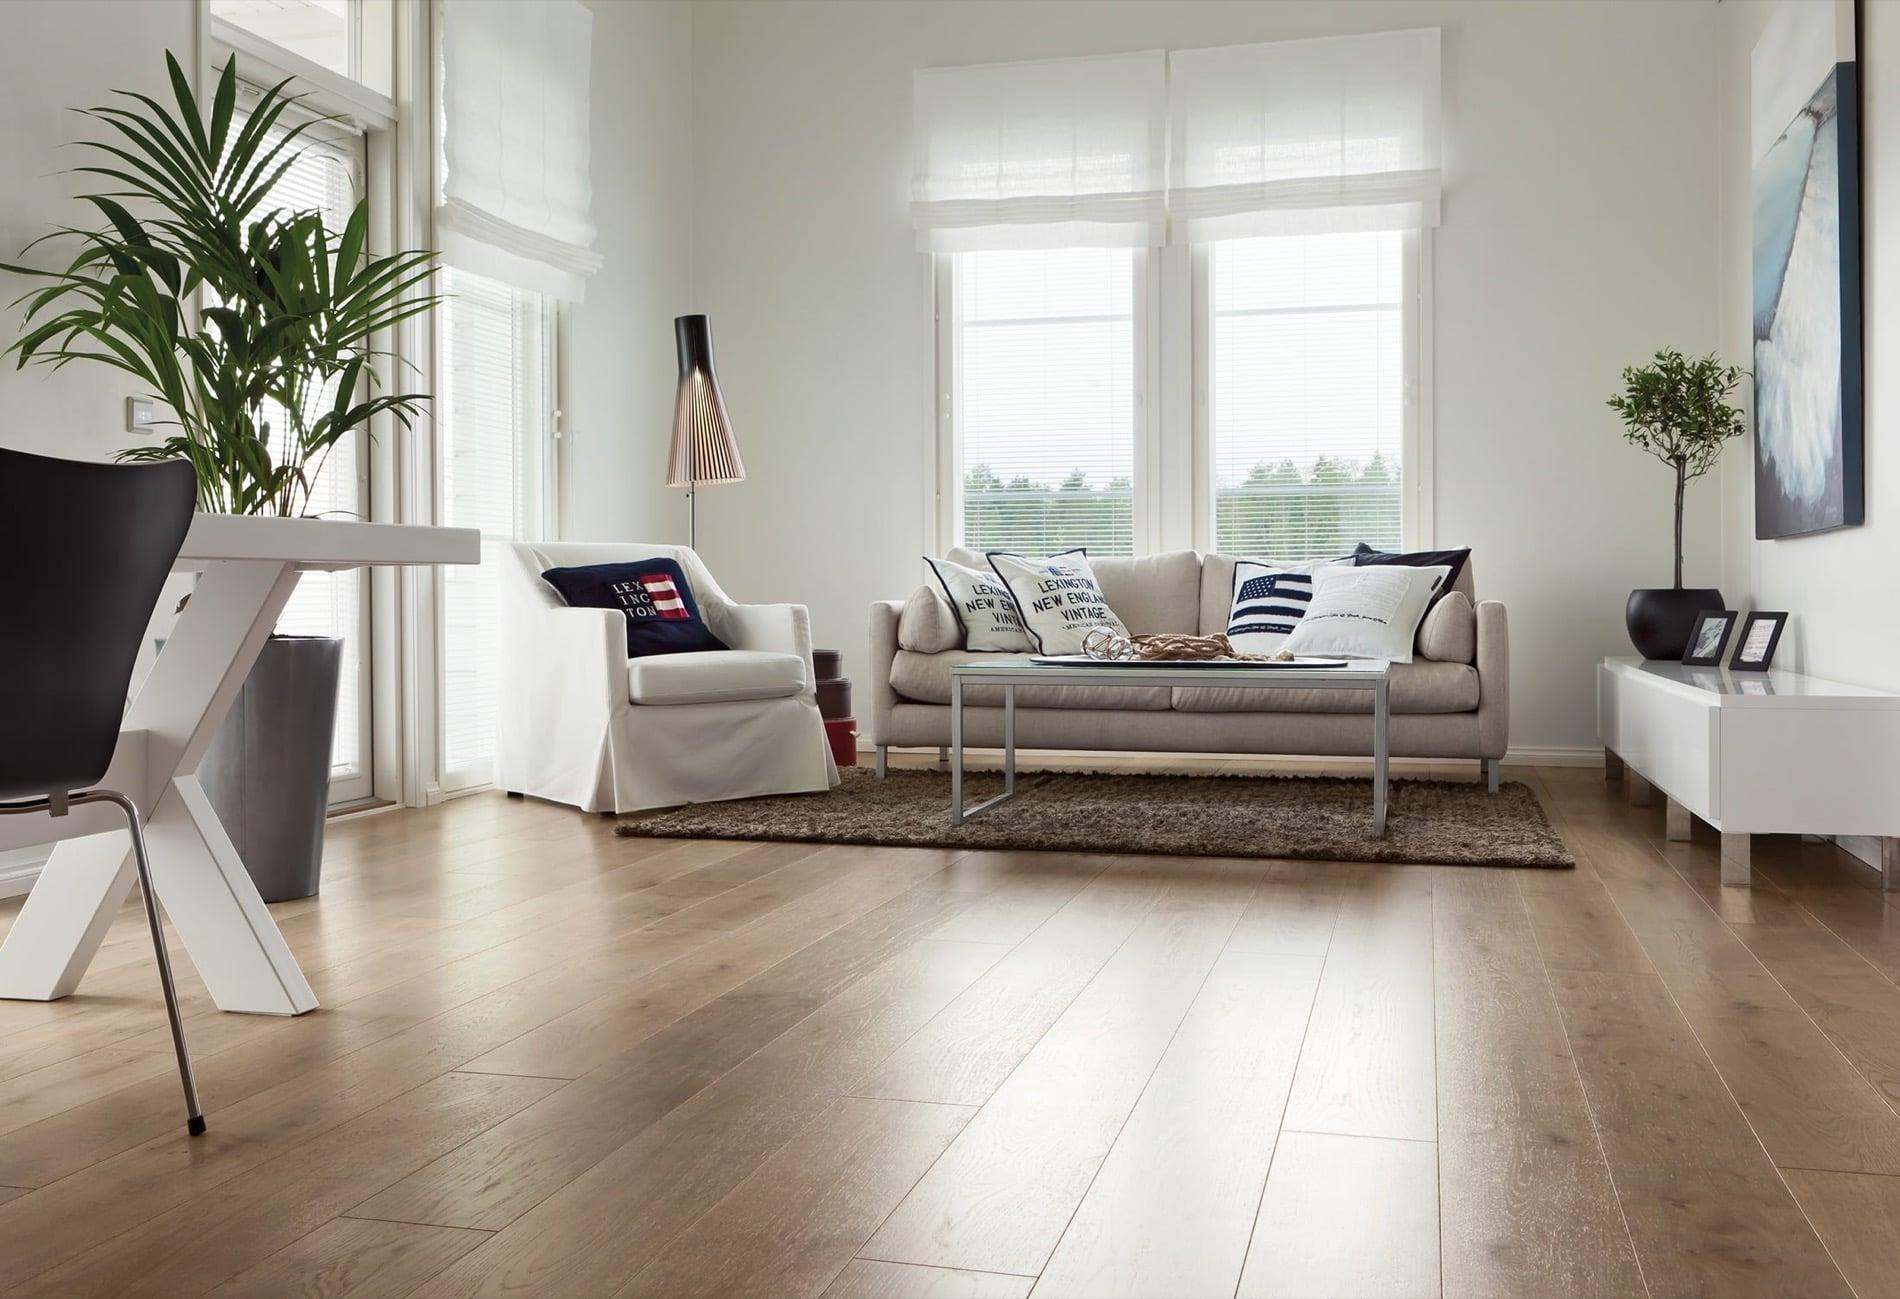 Timberwise-parketti-parquet-wooden floor-puulattia-Tammi-Oak-Handwashed_RUKA_sand_waxoil_horizontal_rgb